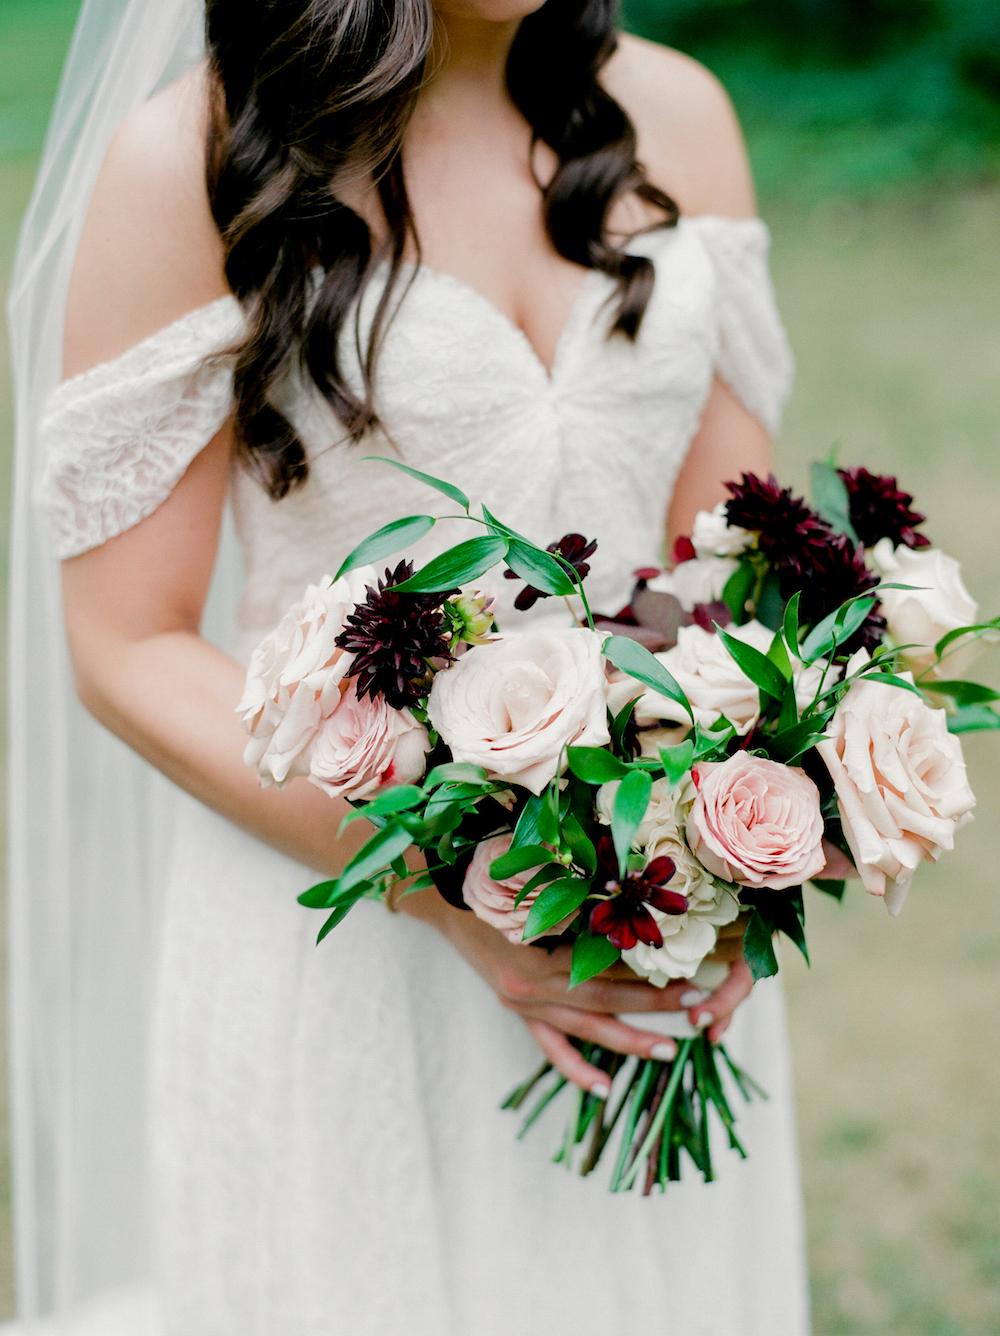 Blush and Berry Wedding Bouquet - Wedding Florists Winnipeg